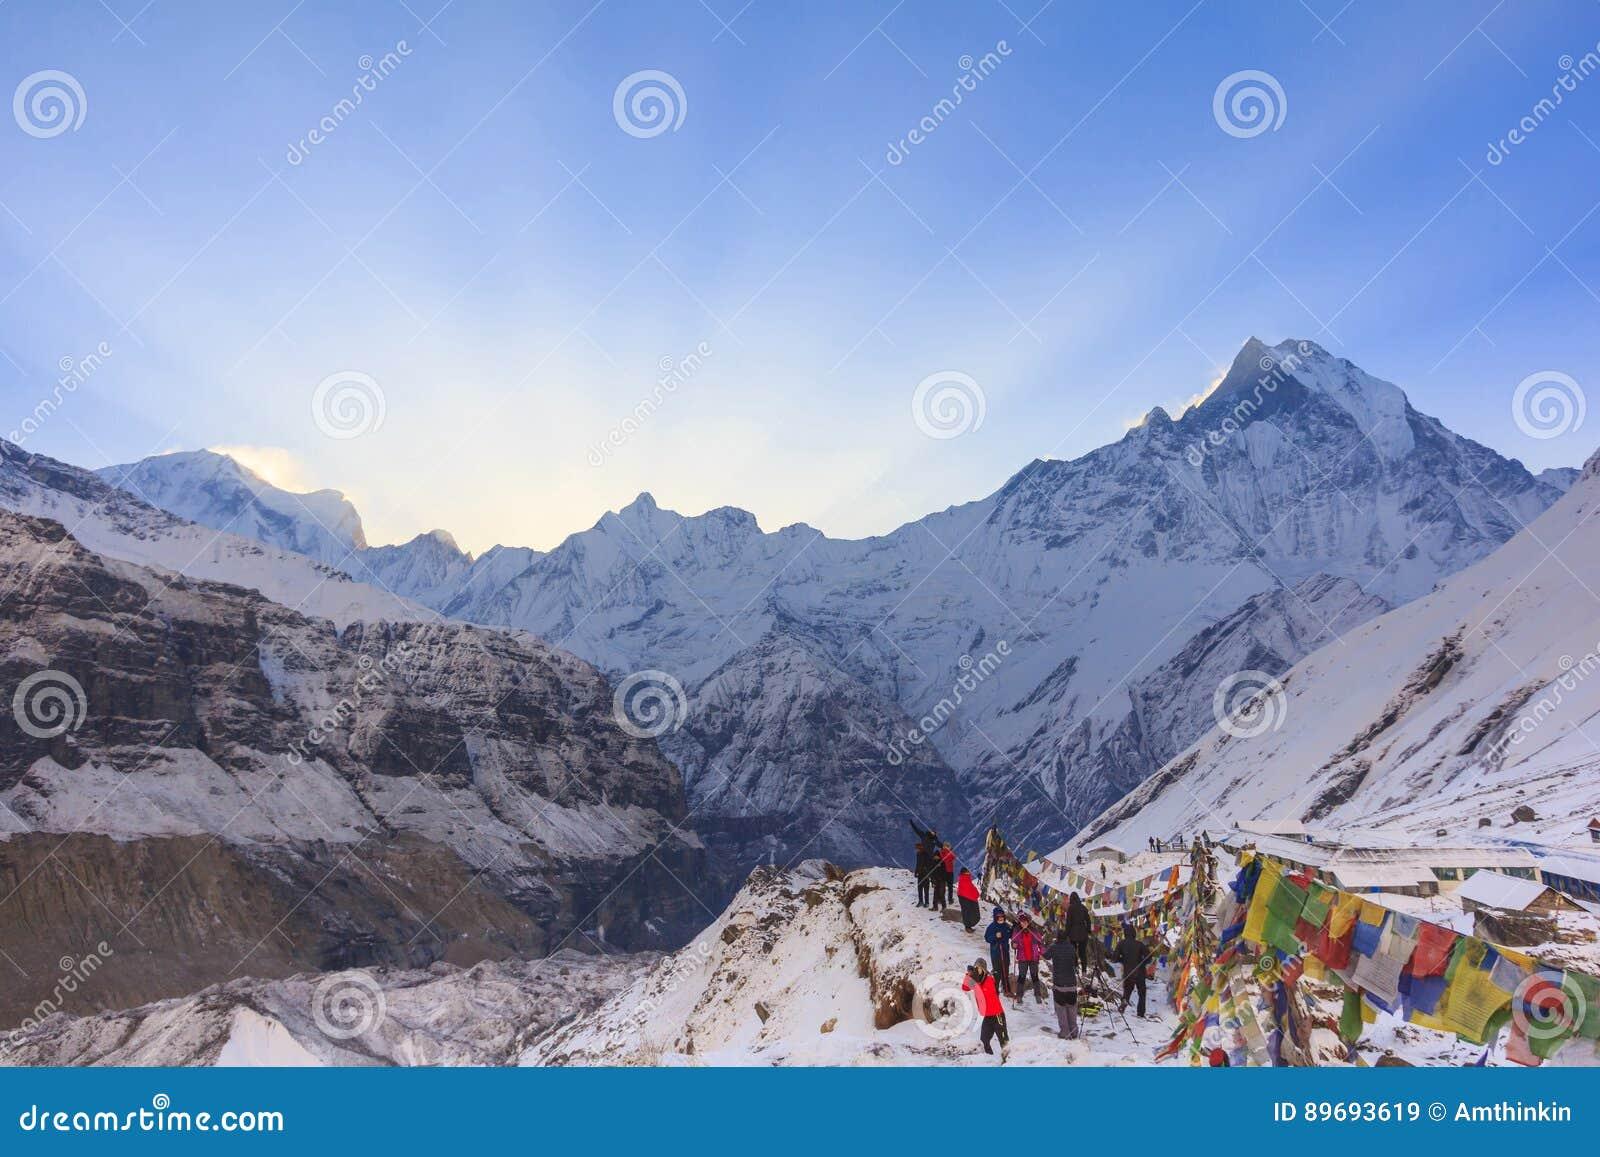 Modlitw flaga i Annapurna śnieżna góra himalaje, Nepal